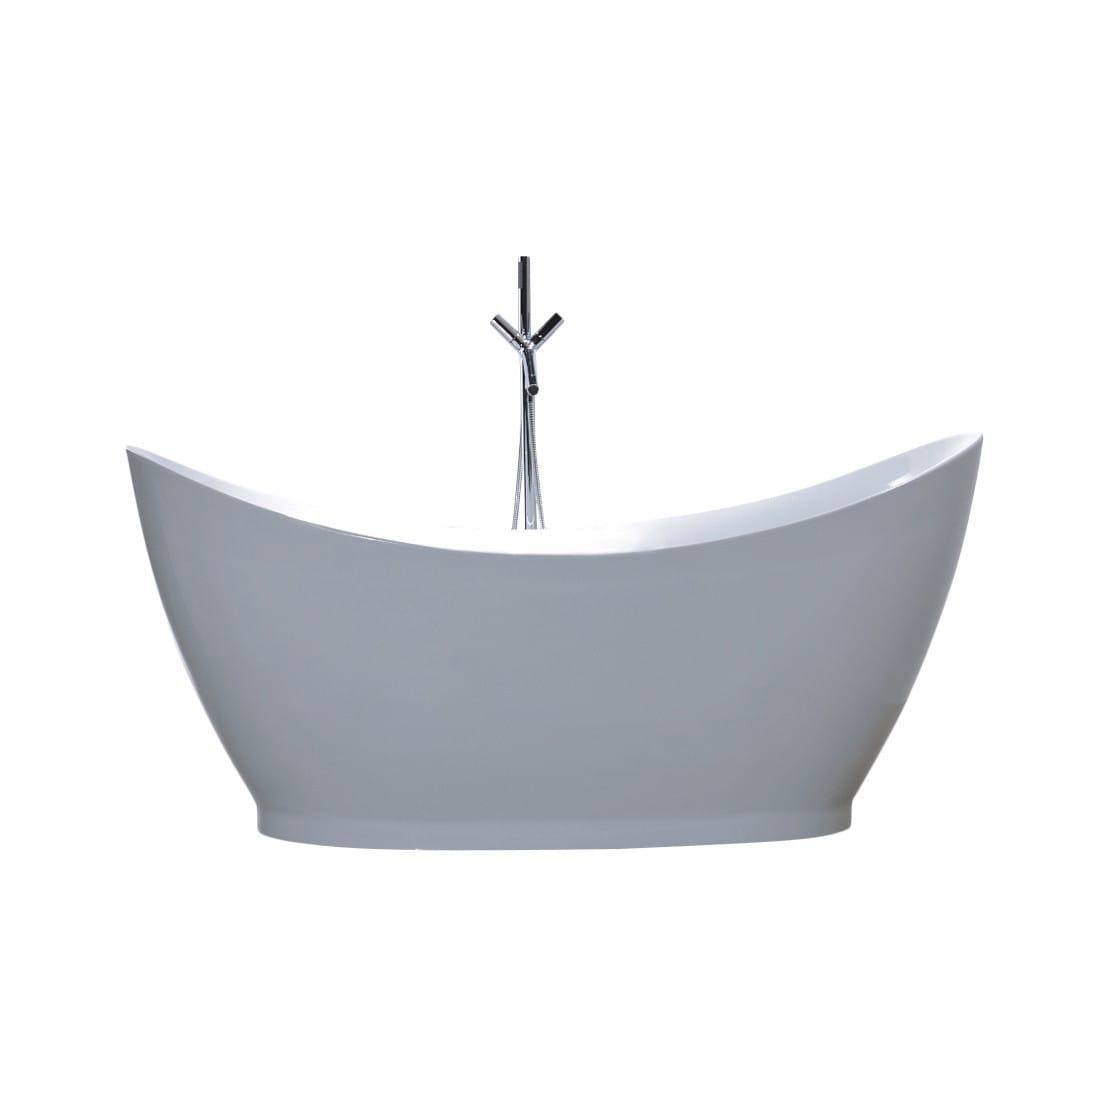 Shop Vanity Art White Acrylic 67.5-inch Freestanding Soaking Bathtub ...